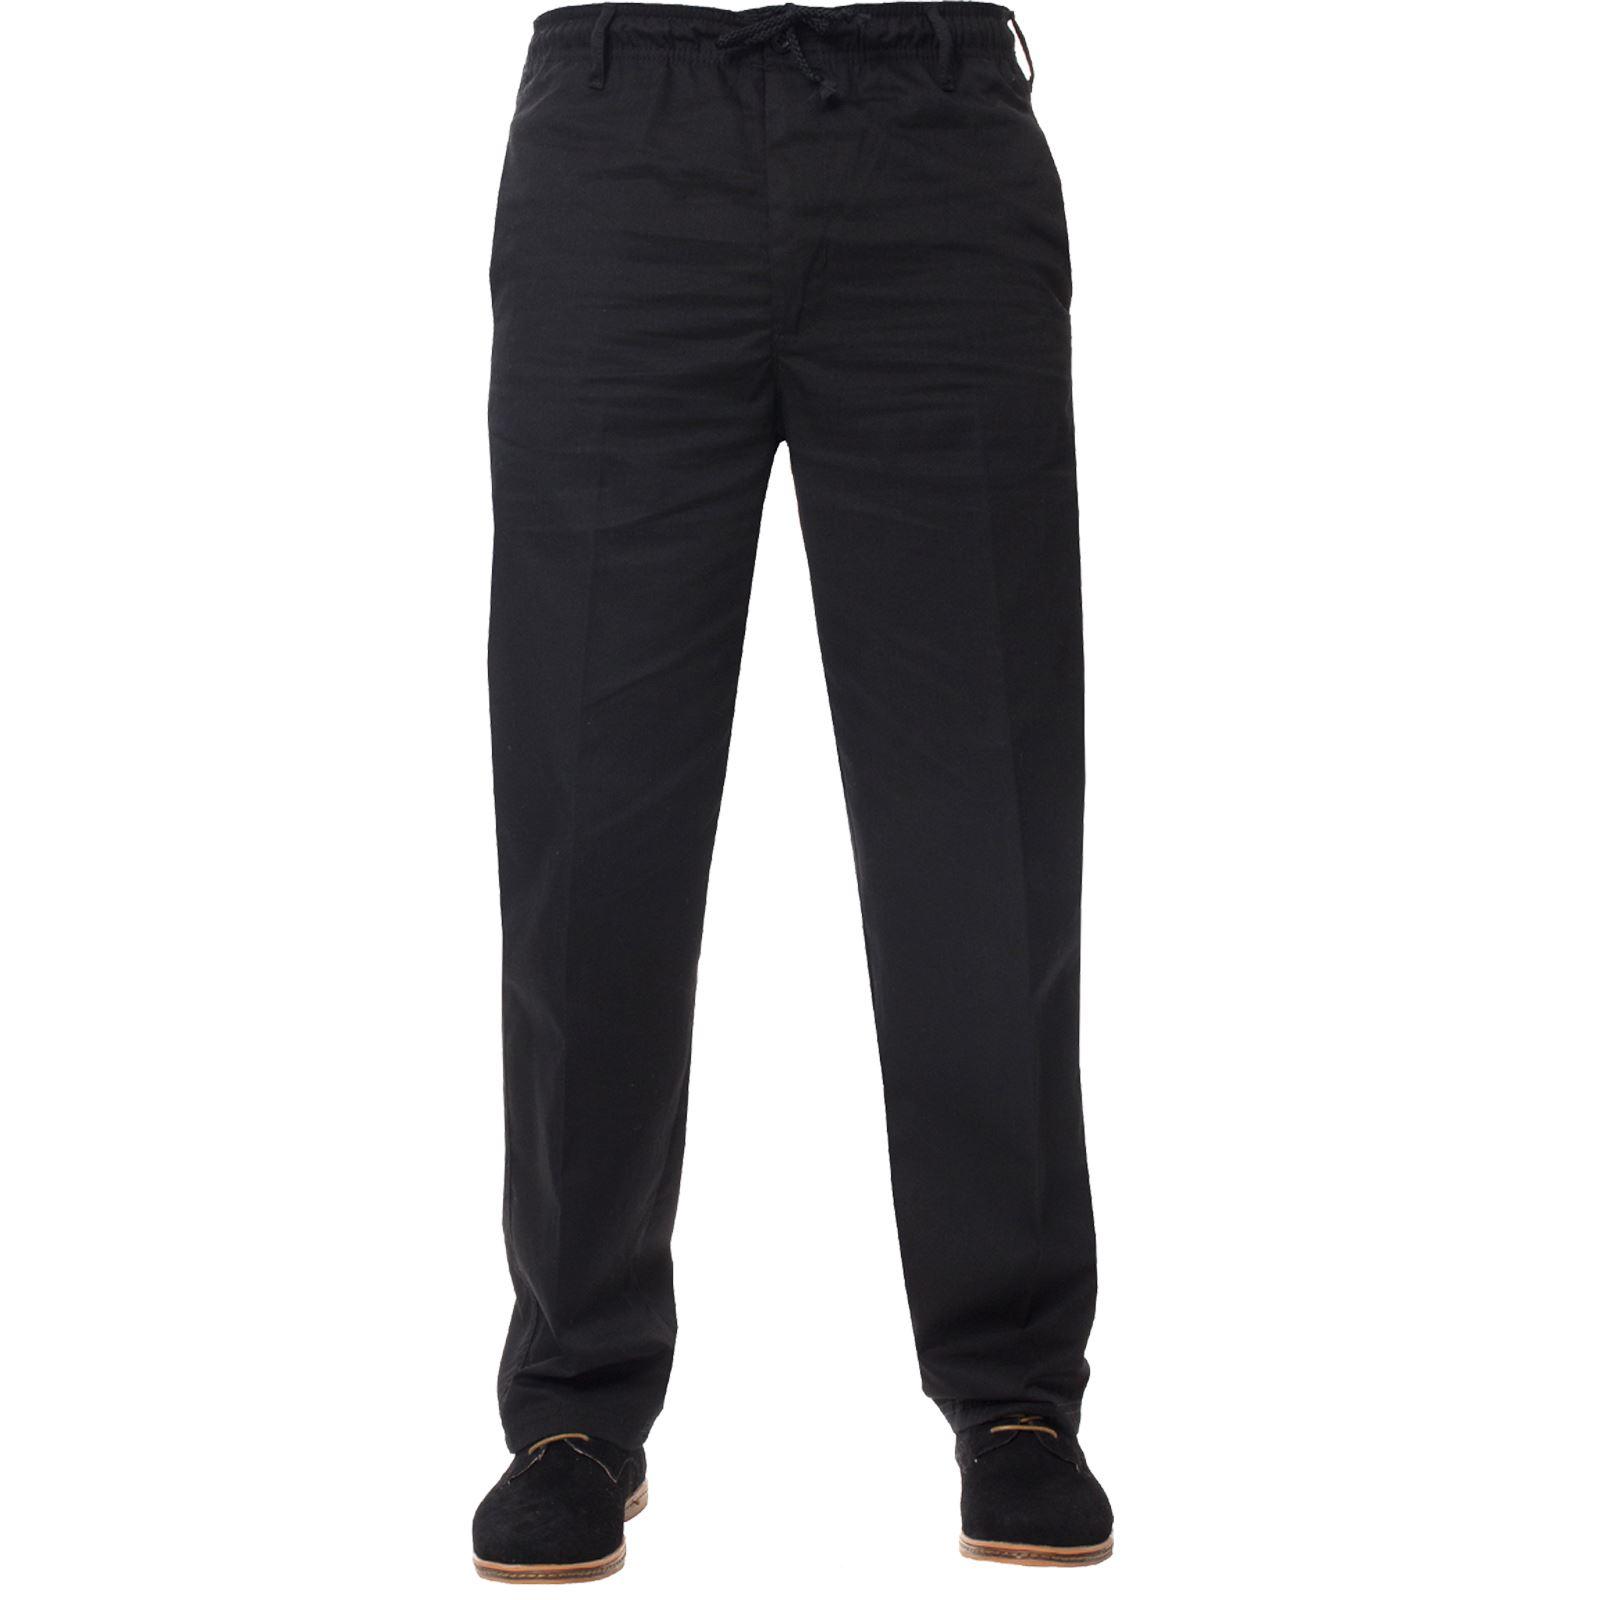 Para-Hombres-Pantalones-De-Rugby-Kruze-cintura-elastica-con-cordon-pantalones-REGULAR-King-Tamanos miniatura 3